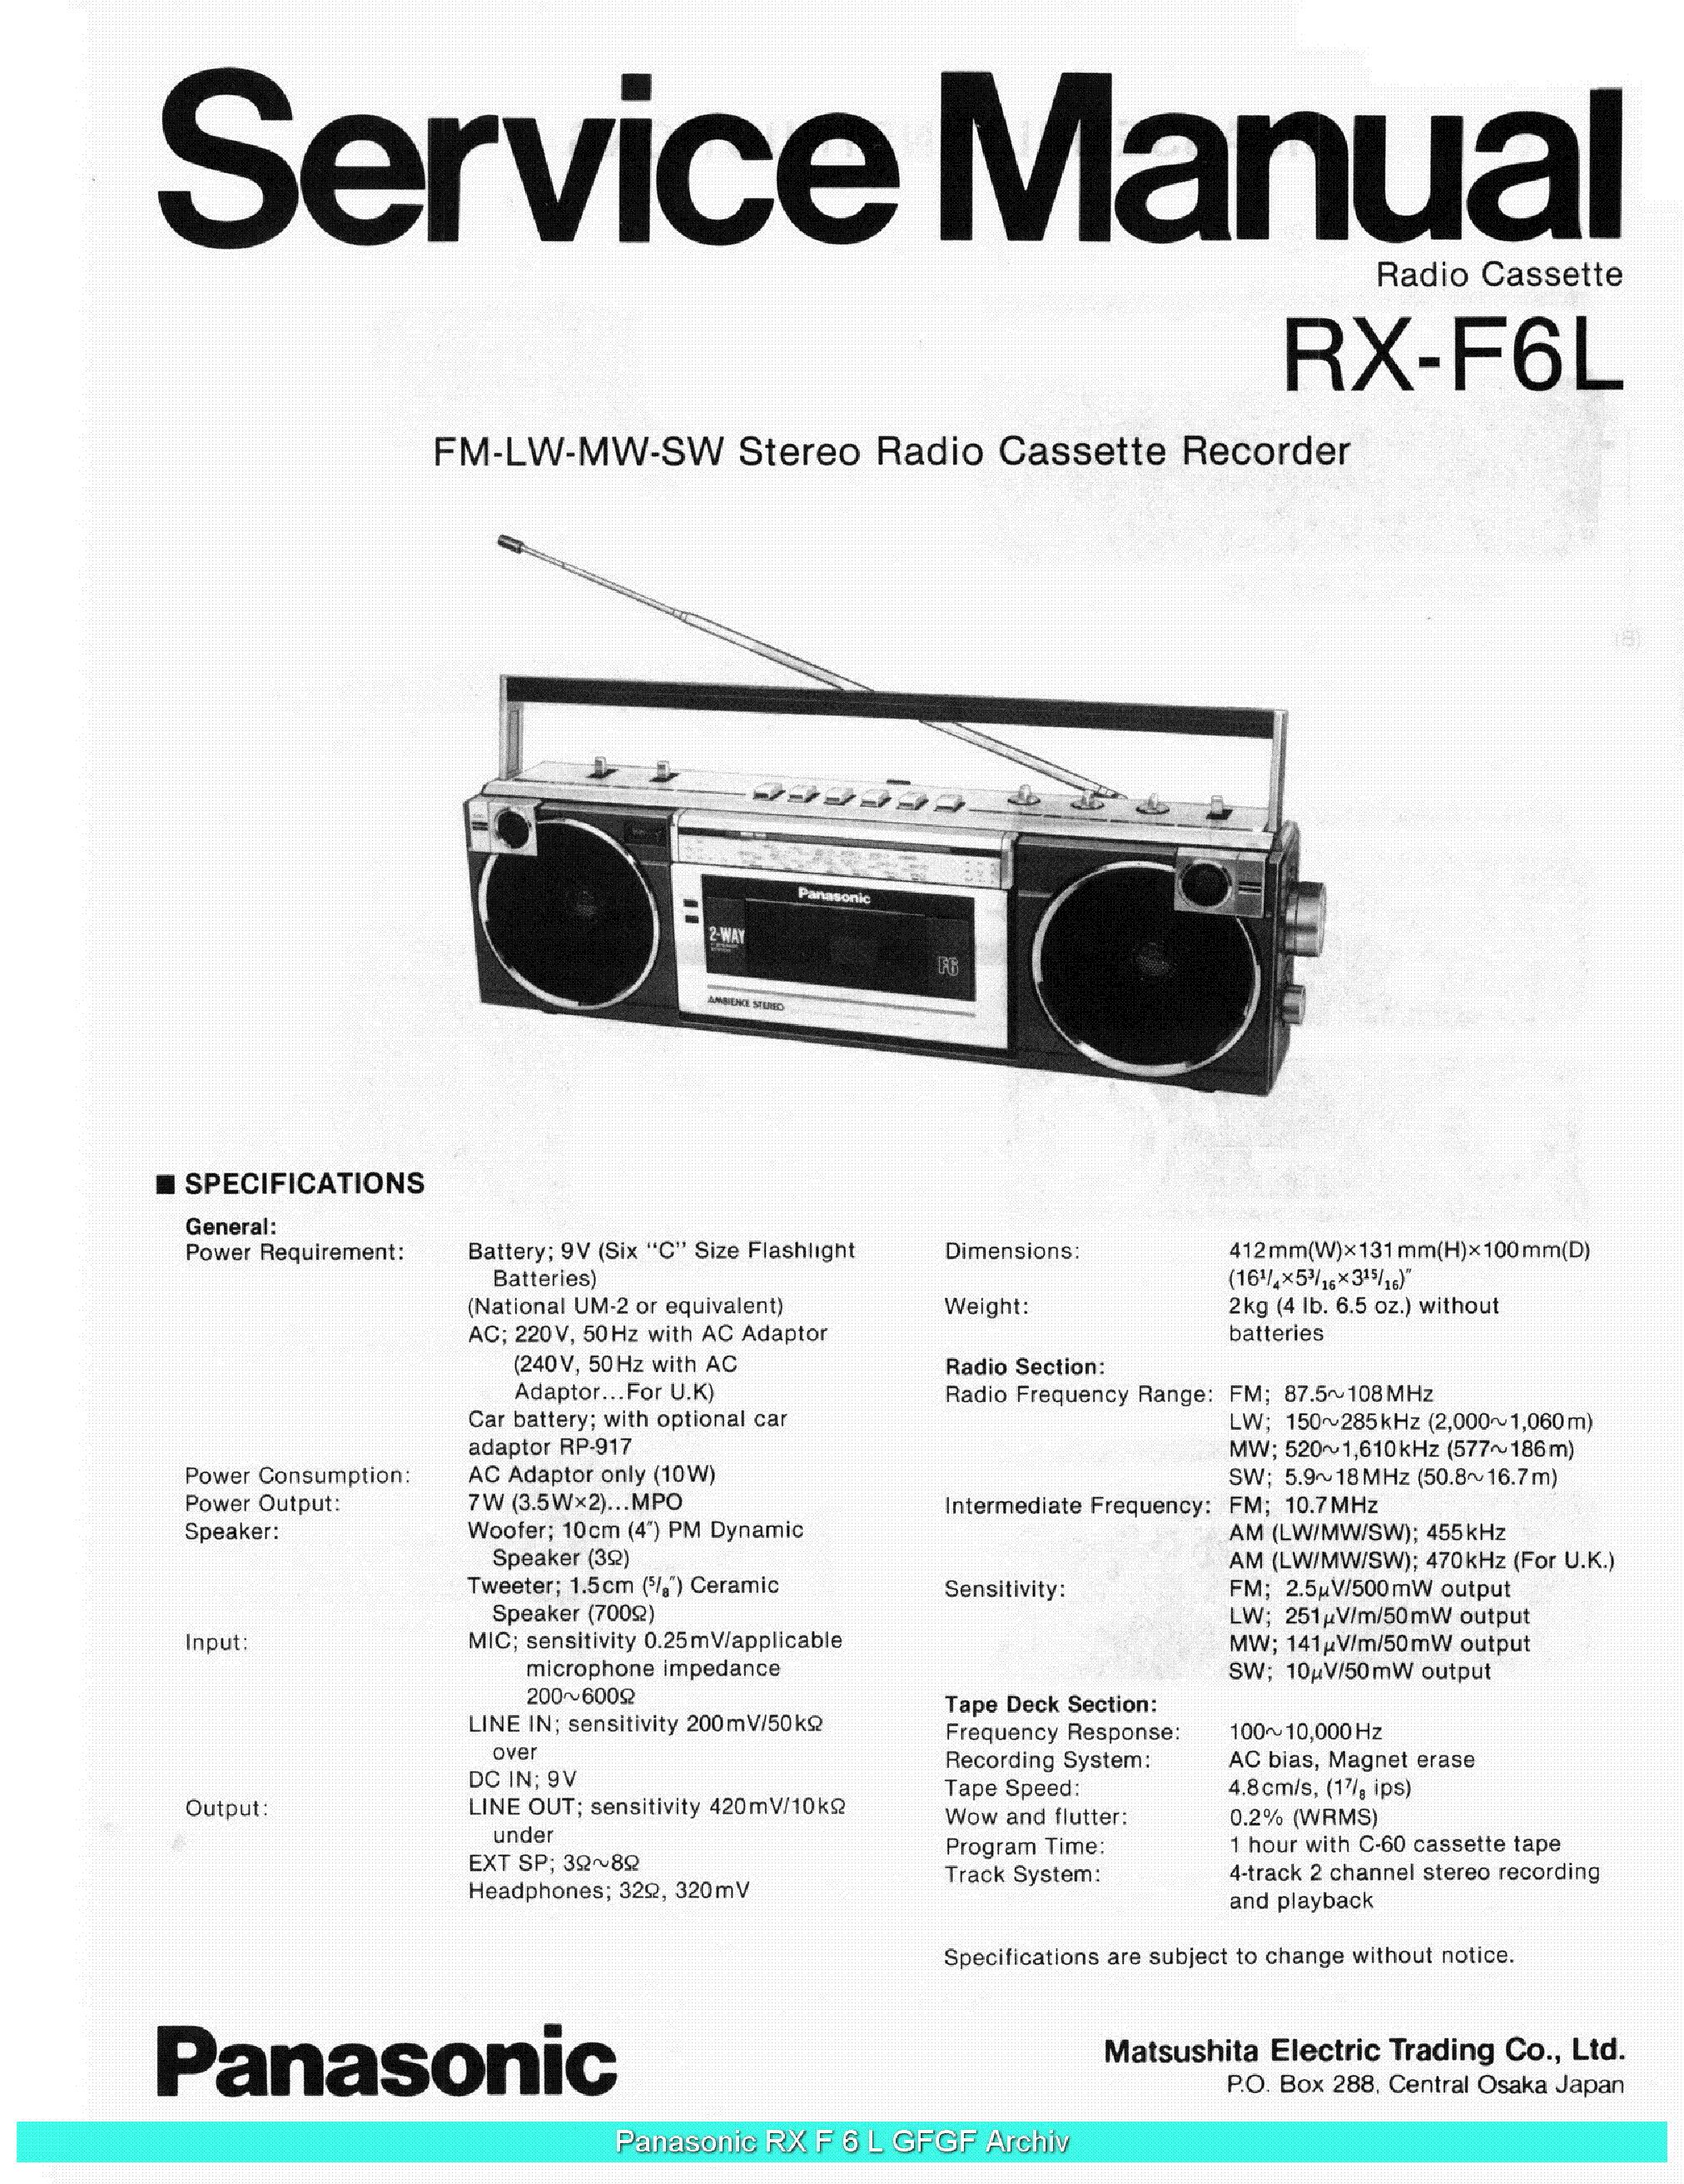 PANASONIC RXF6L SCH service manual (1st page)